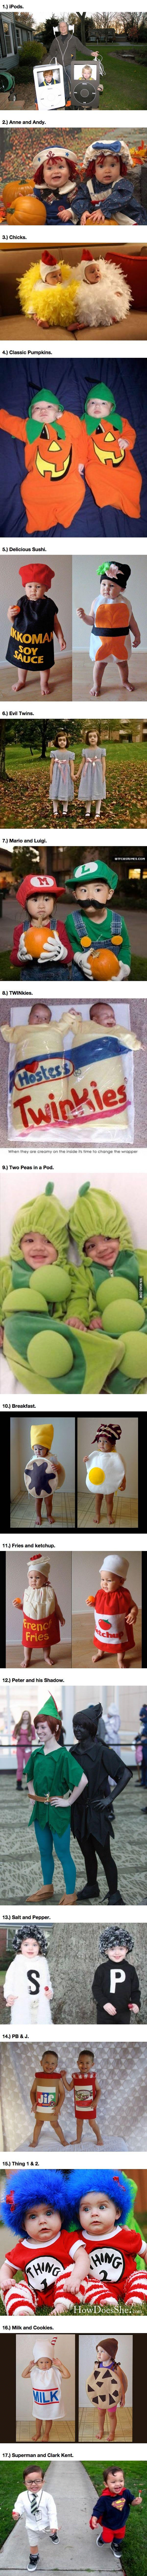 61 best Halloween images on Pinterest